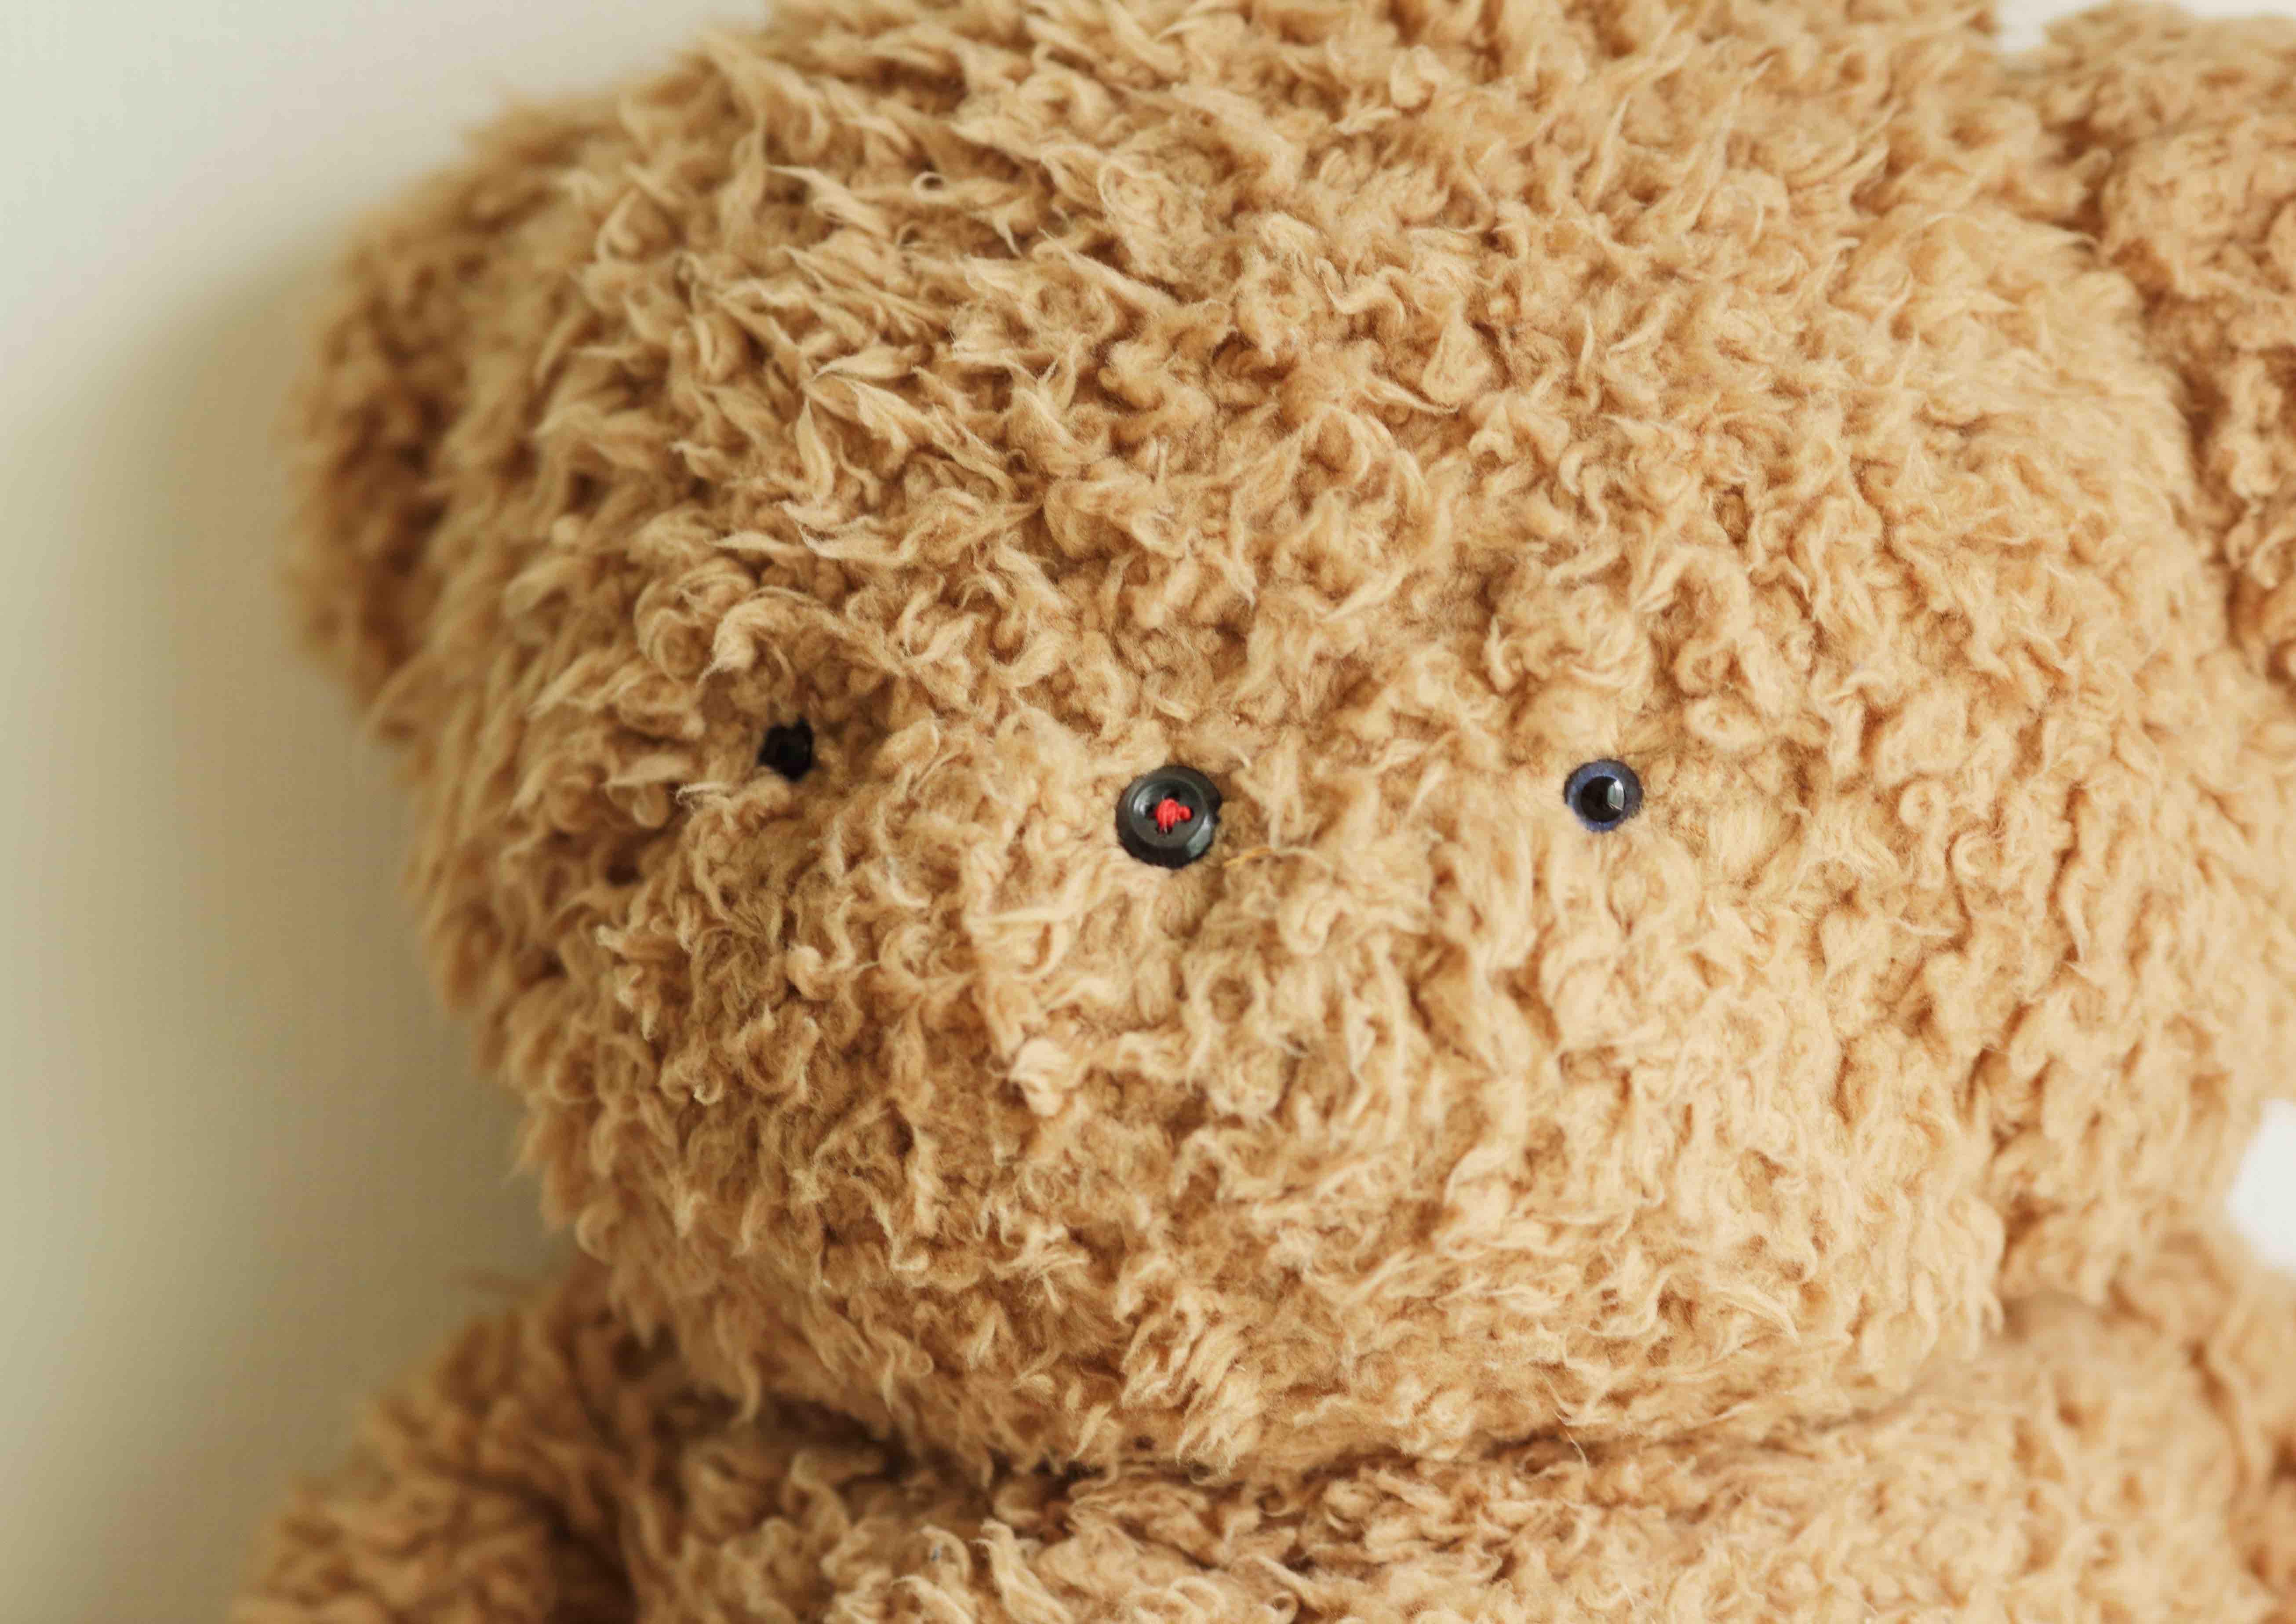 Dona El Regalo De Tu Ex: Peruvians Are Donating Teddy Bears From Their Exes to Needy Children